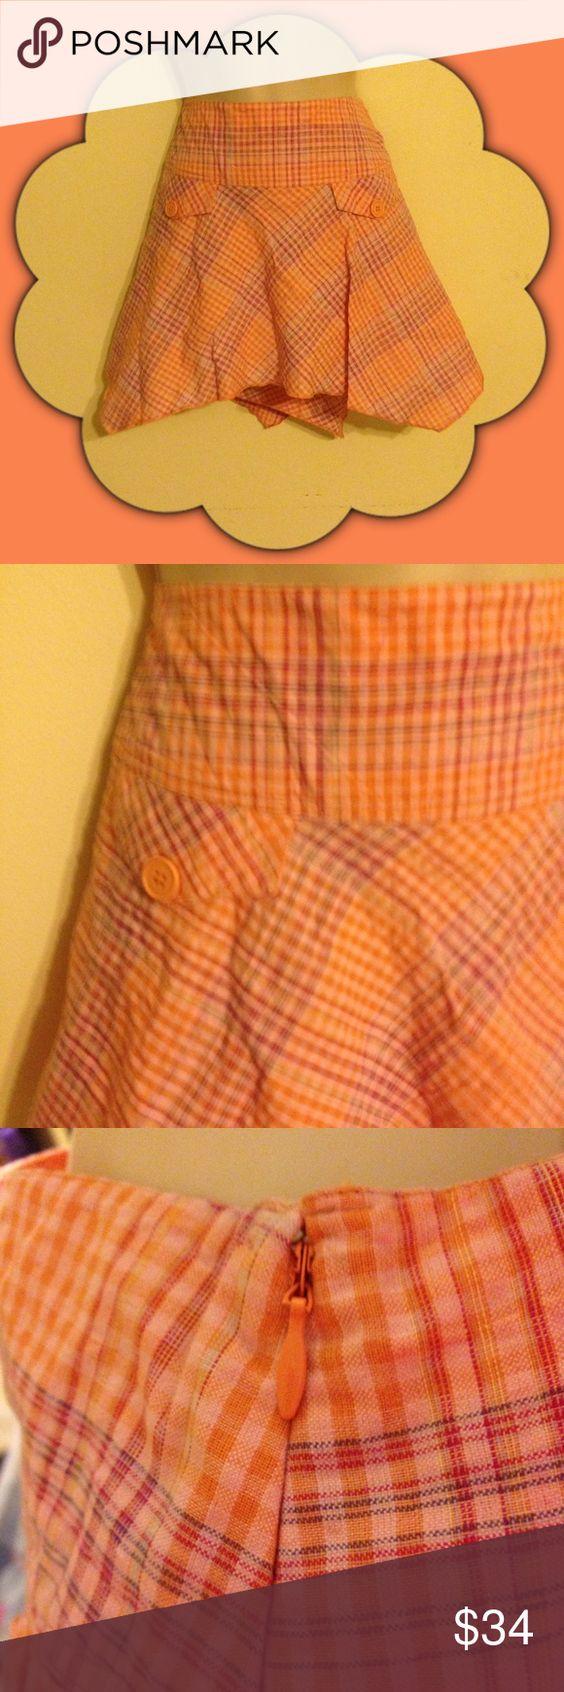 Billabong Orange w/Stripes Astmetrical Skirt Sz 7 Side zipper closure mock front pockets has pink purple and green stripe accent Billabong Skirts Asymmetrical